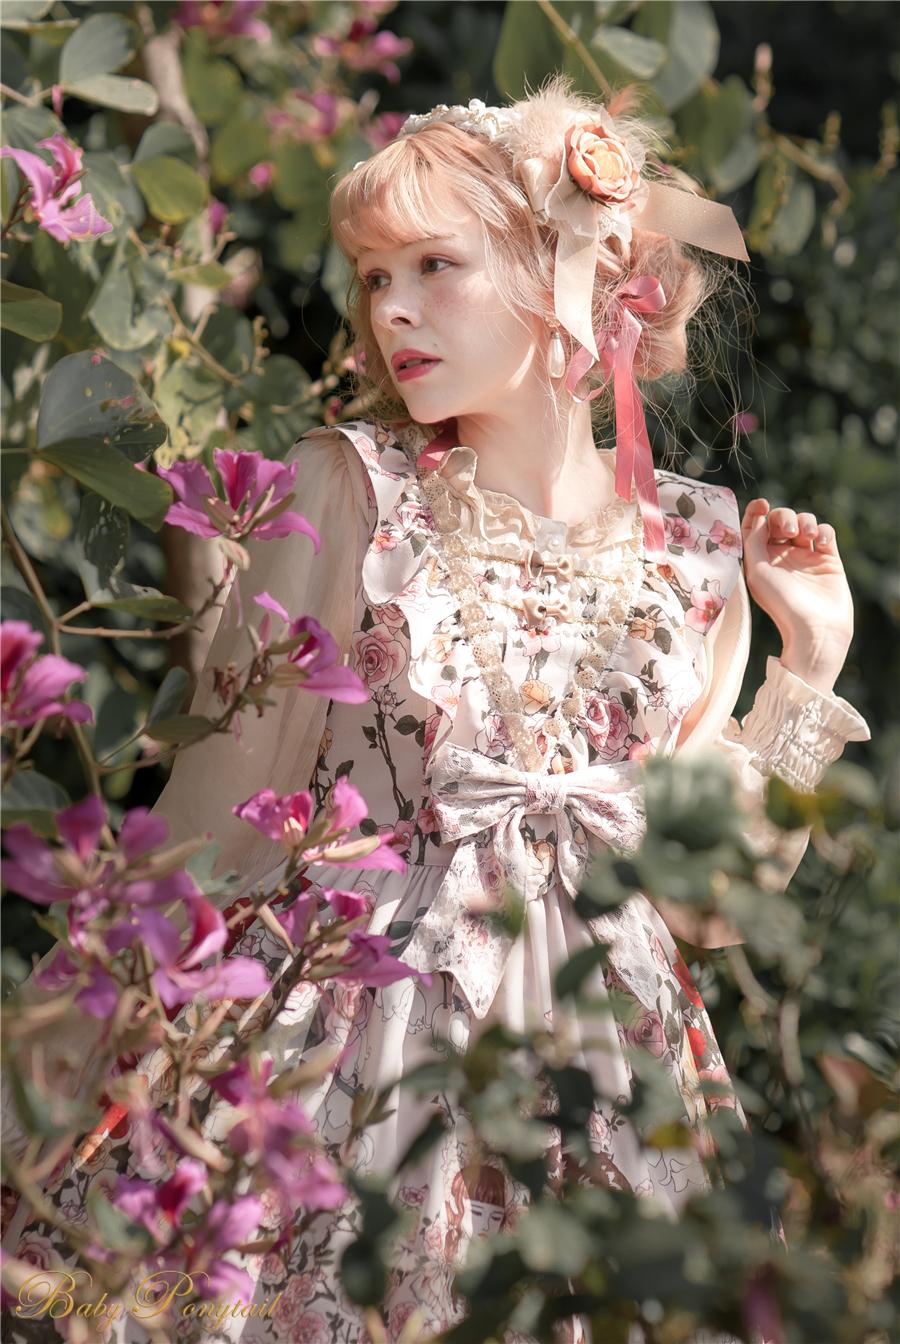 Polly's Garden of Dreams_Model Preview_Ivory JSK_08.jpg